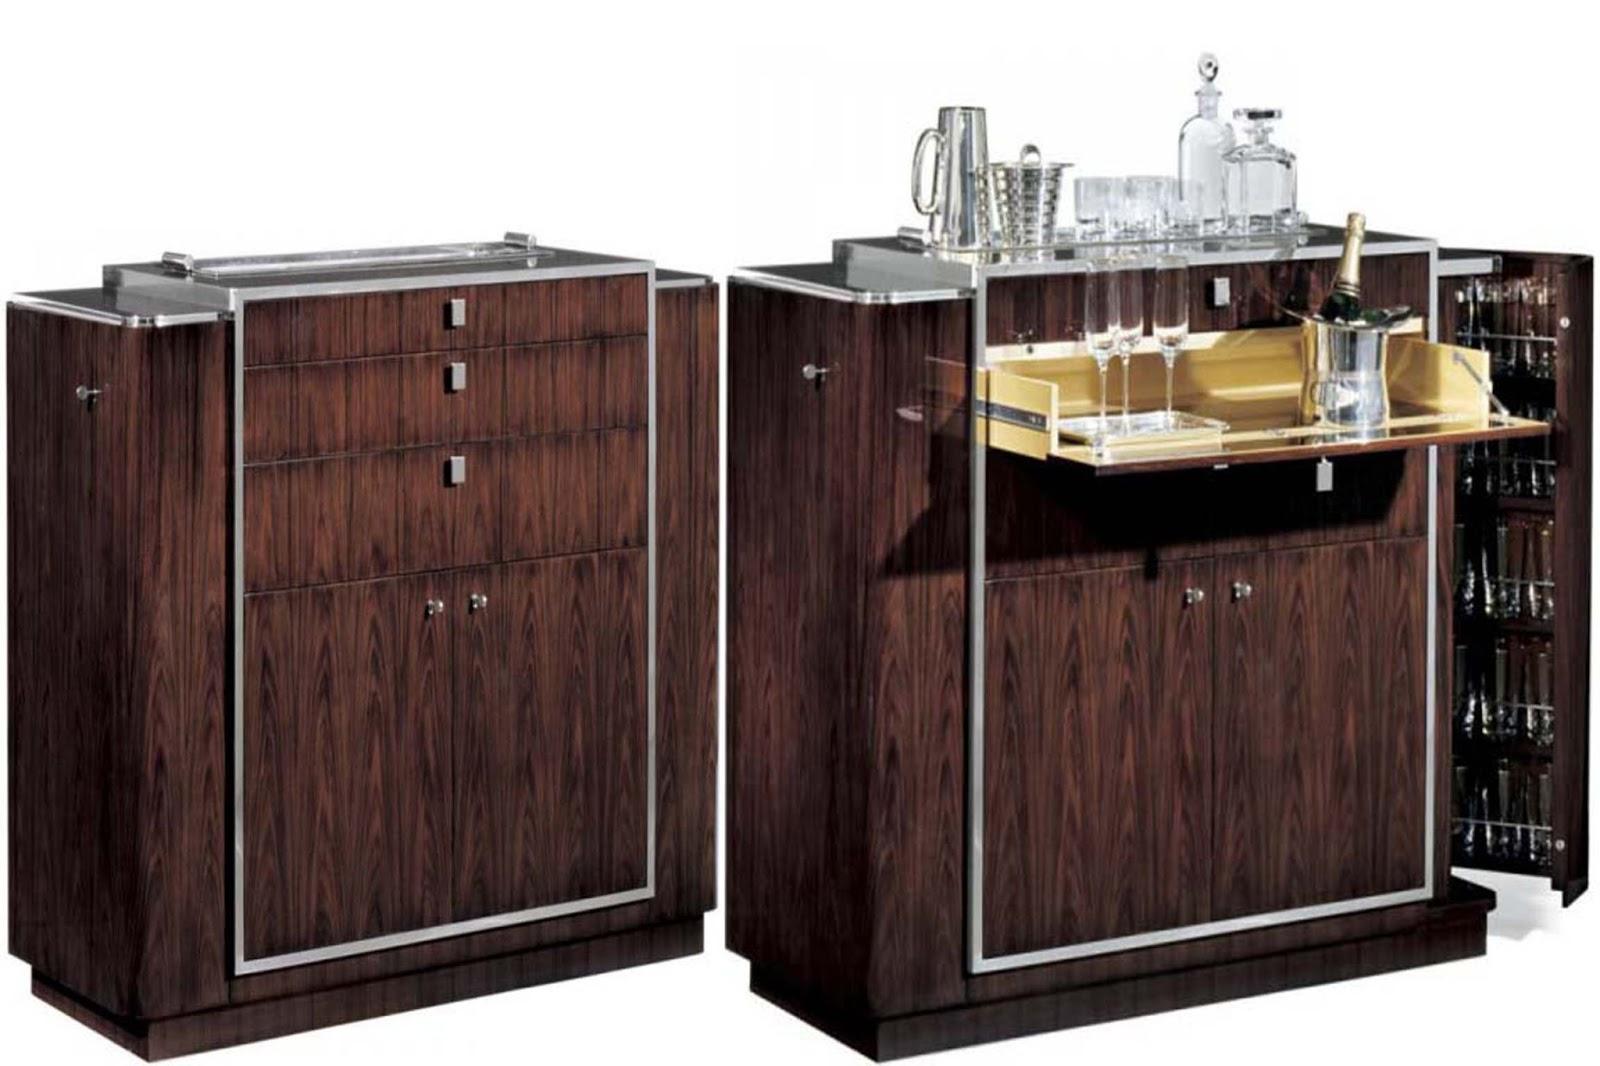 Ralph Laurent Y Su Nuevo Mueble Bar Duke